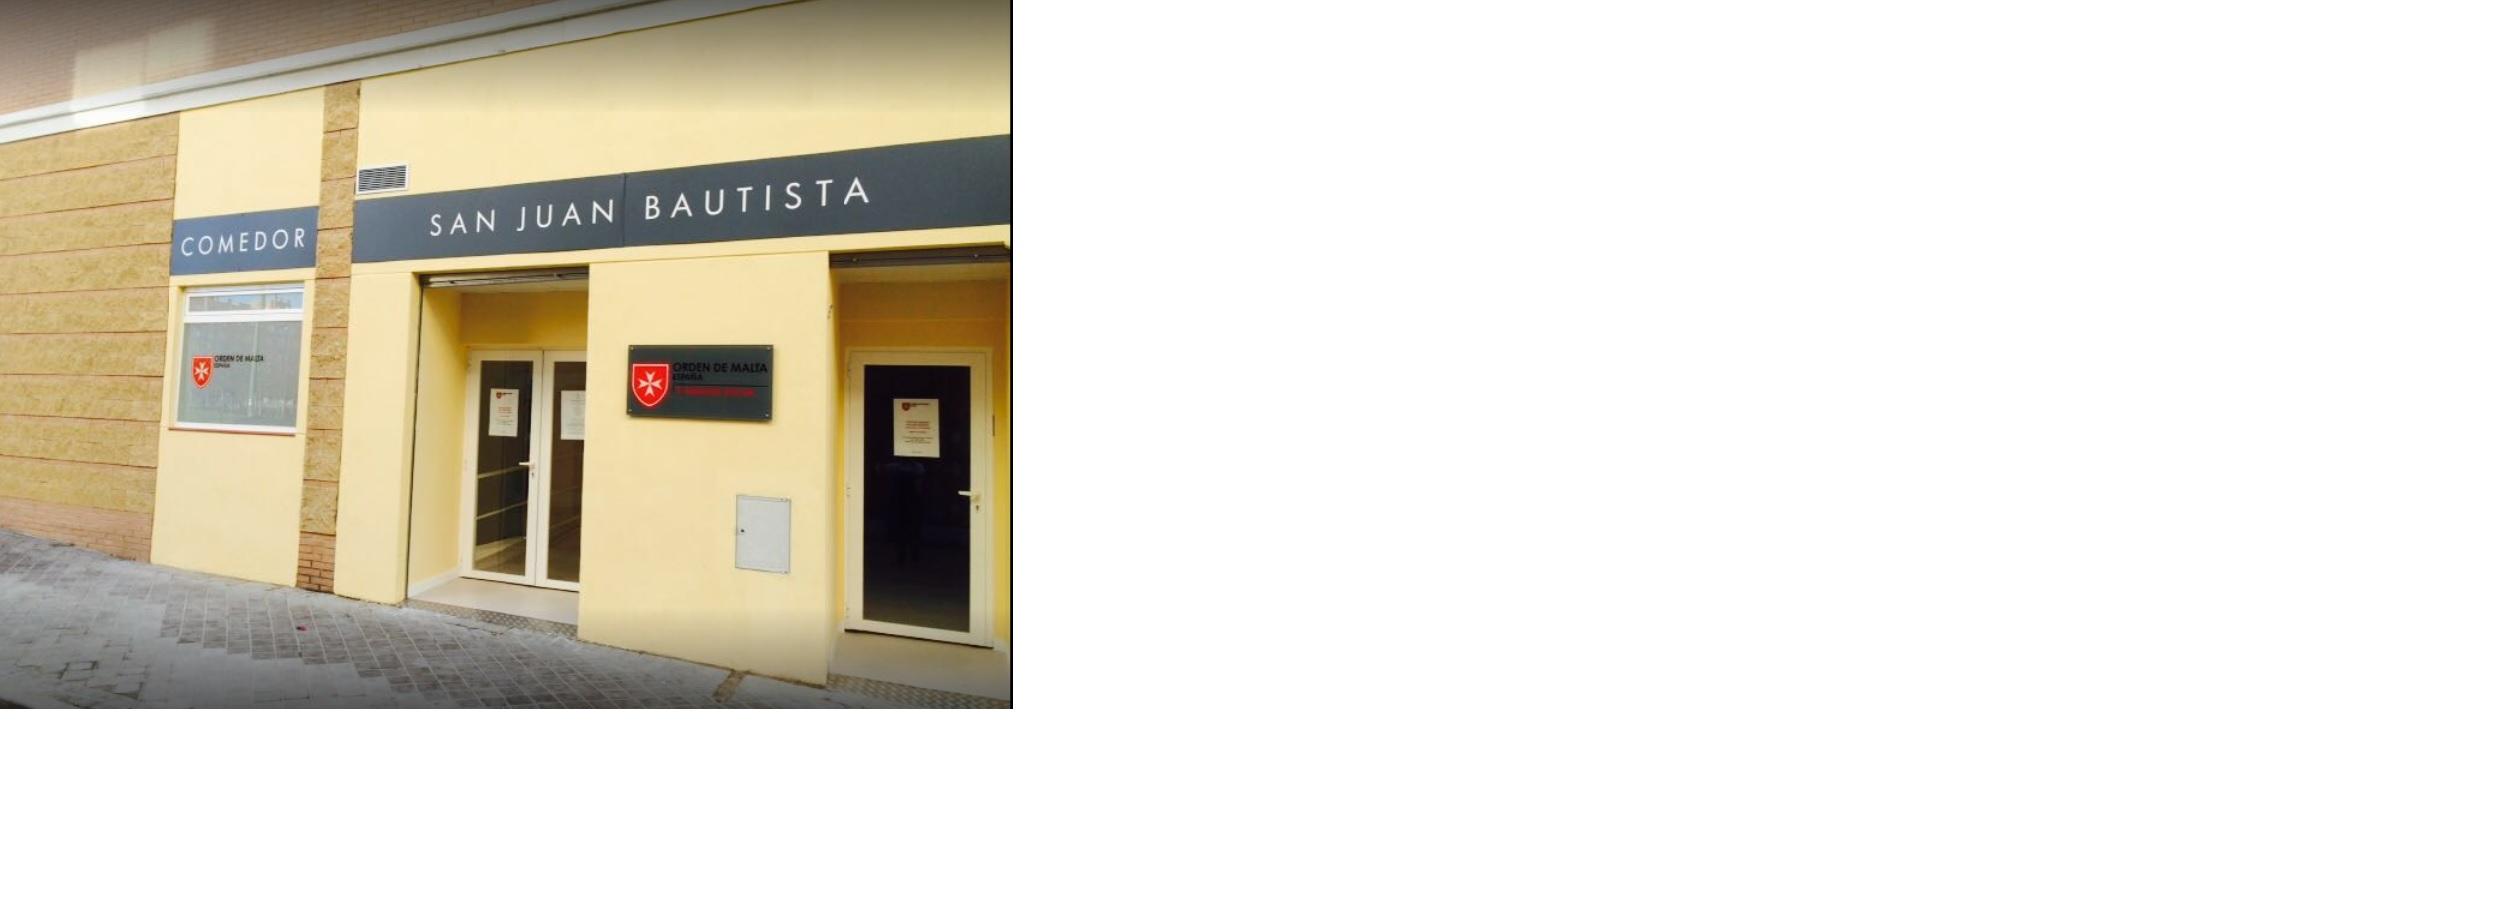 Comedor San Juan Bautista | Orden de Malta